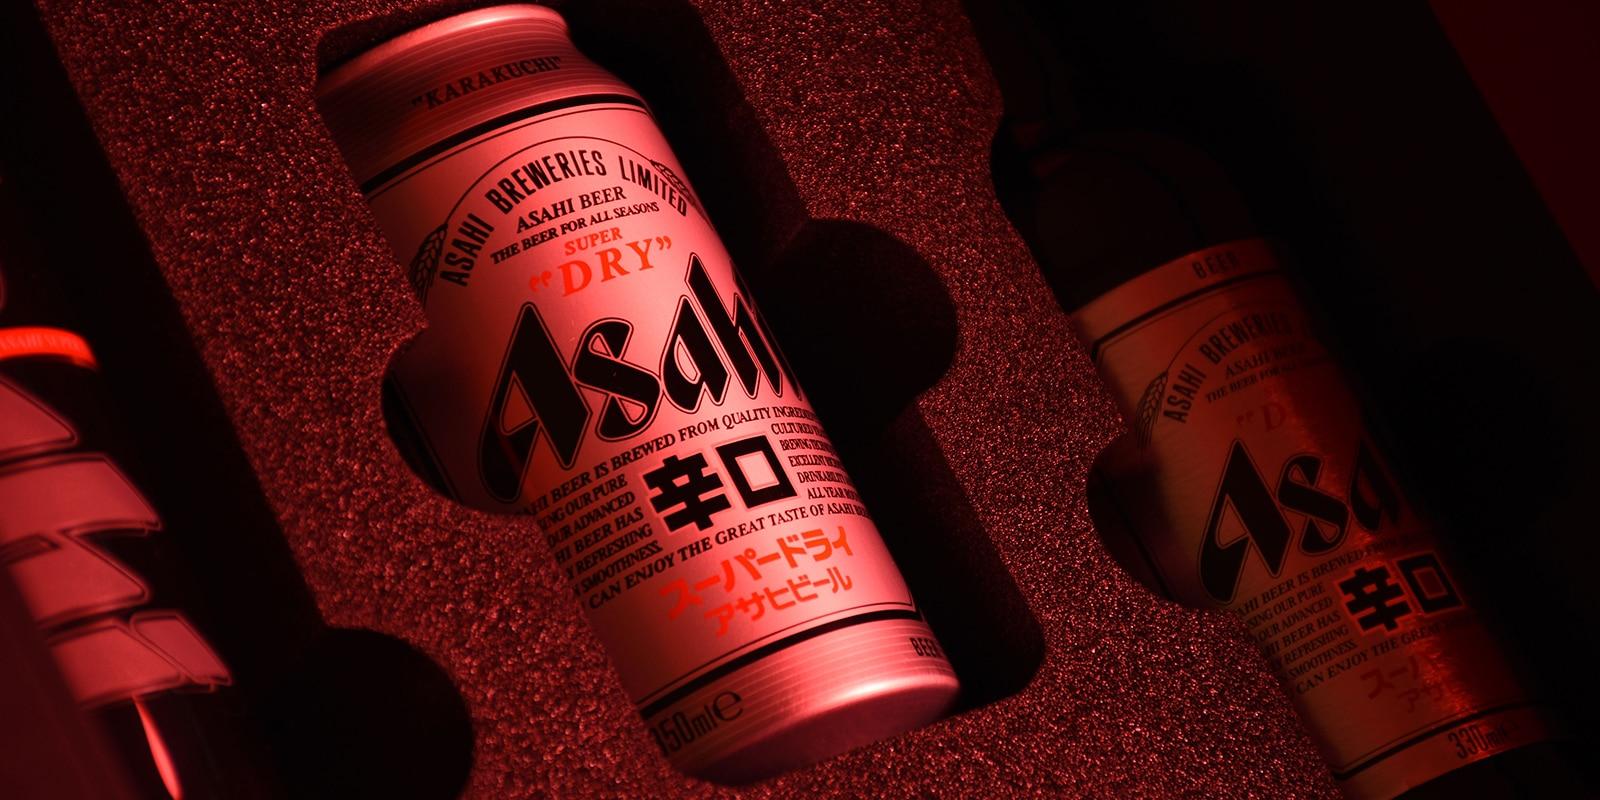 65333_QM_Website_ASD_Brand_Pack_Images_1600x800-6